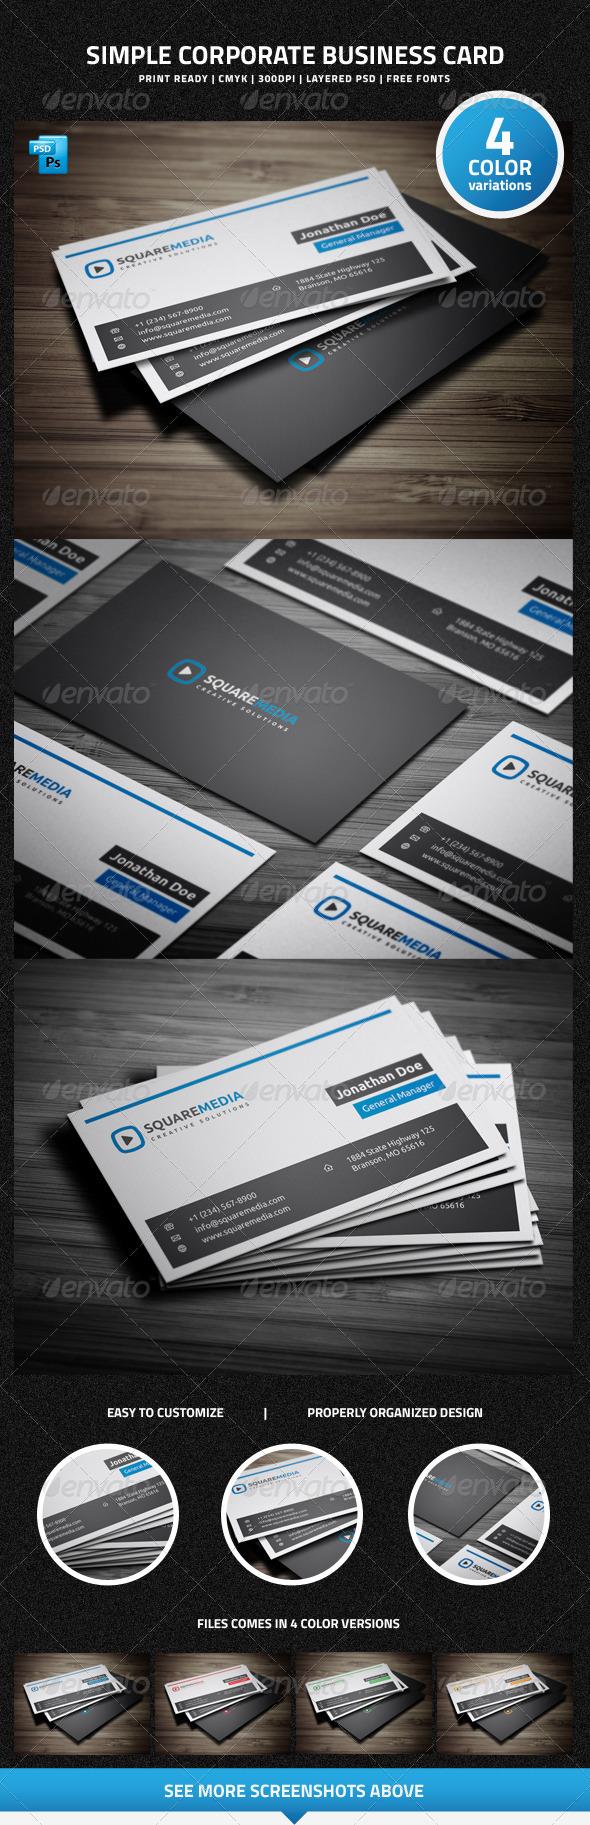 Simple Corporate Business Card - 18 - Corporate Business Cards